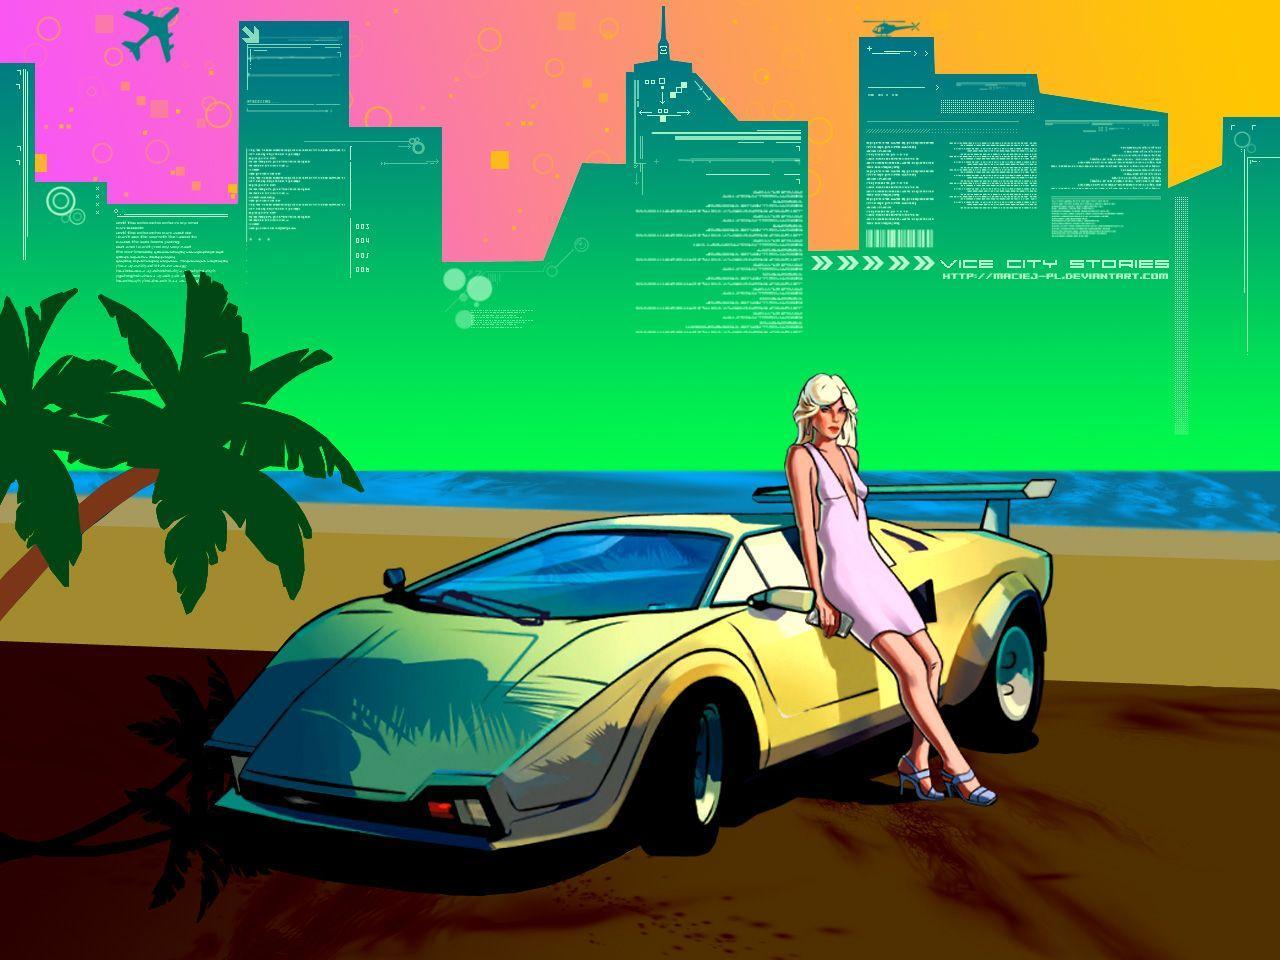 gta vice city iphone wallpaper